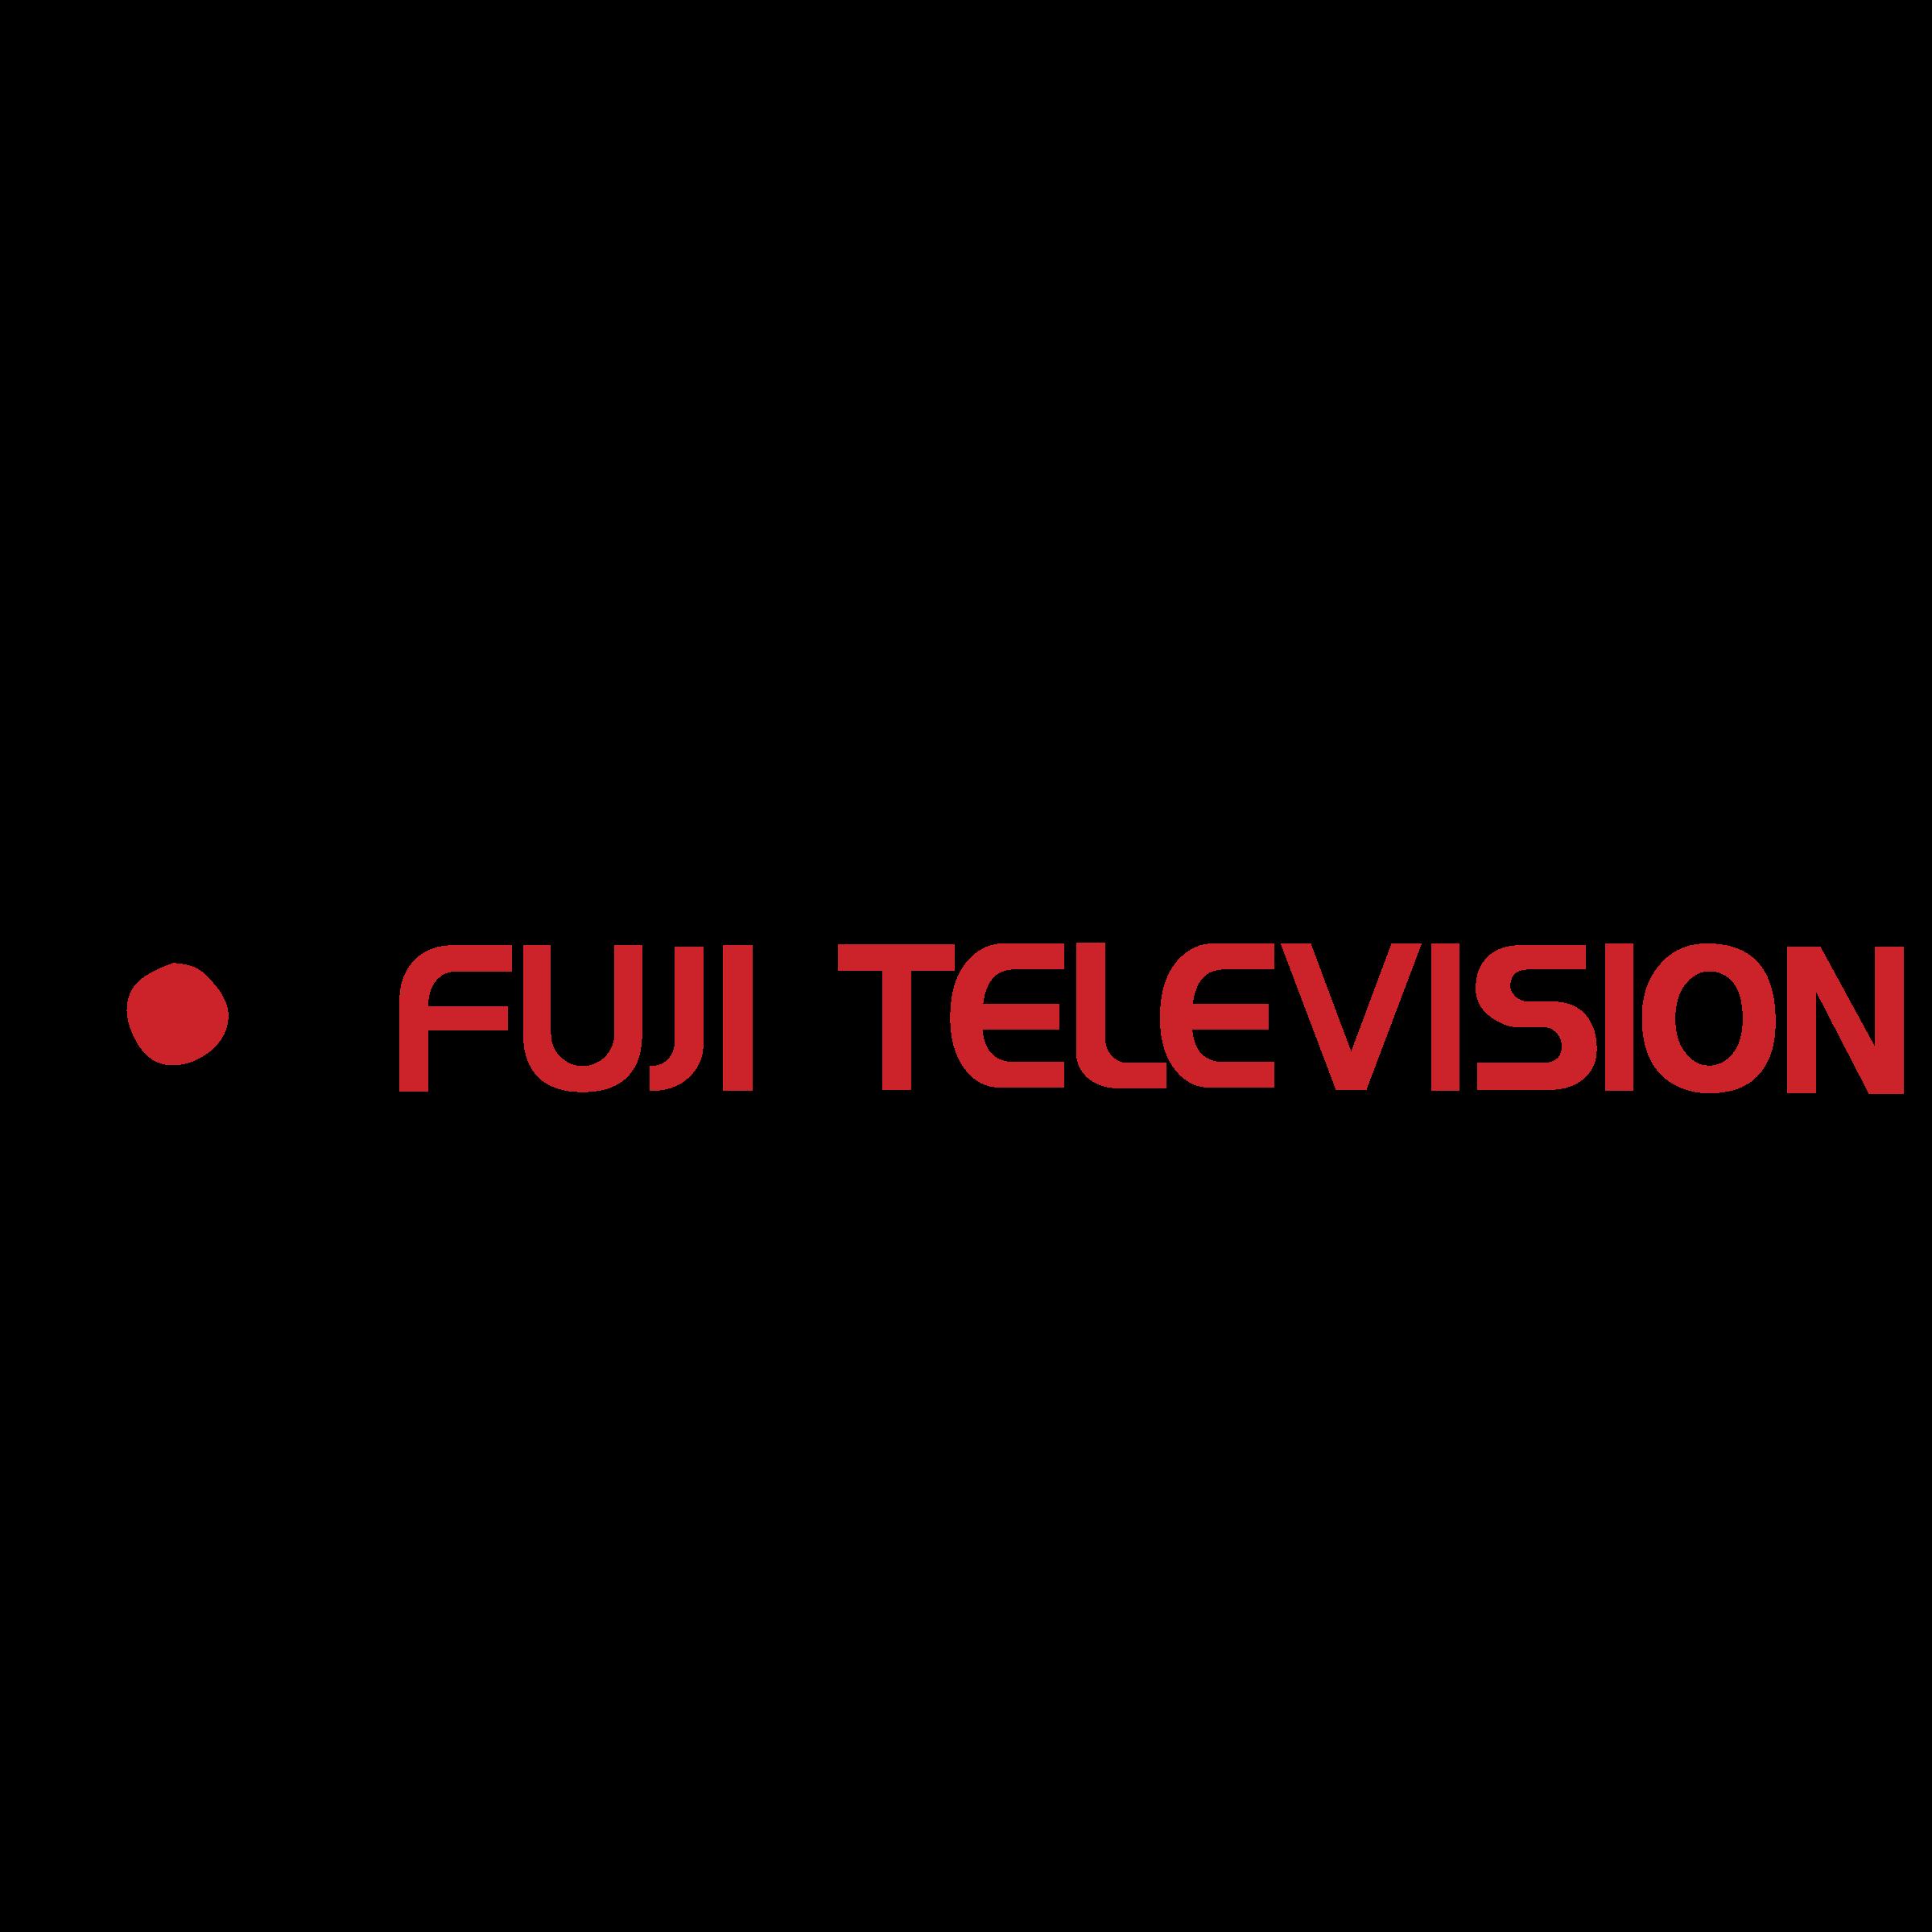 Fuji Television Logo PNG Transparent & SVG Vector - Freebie